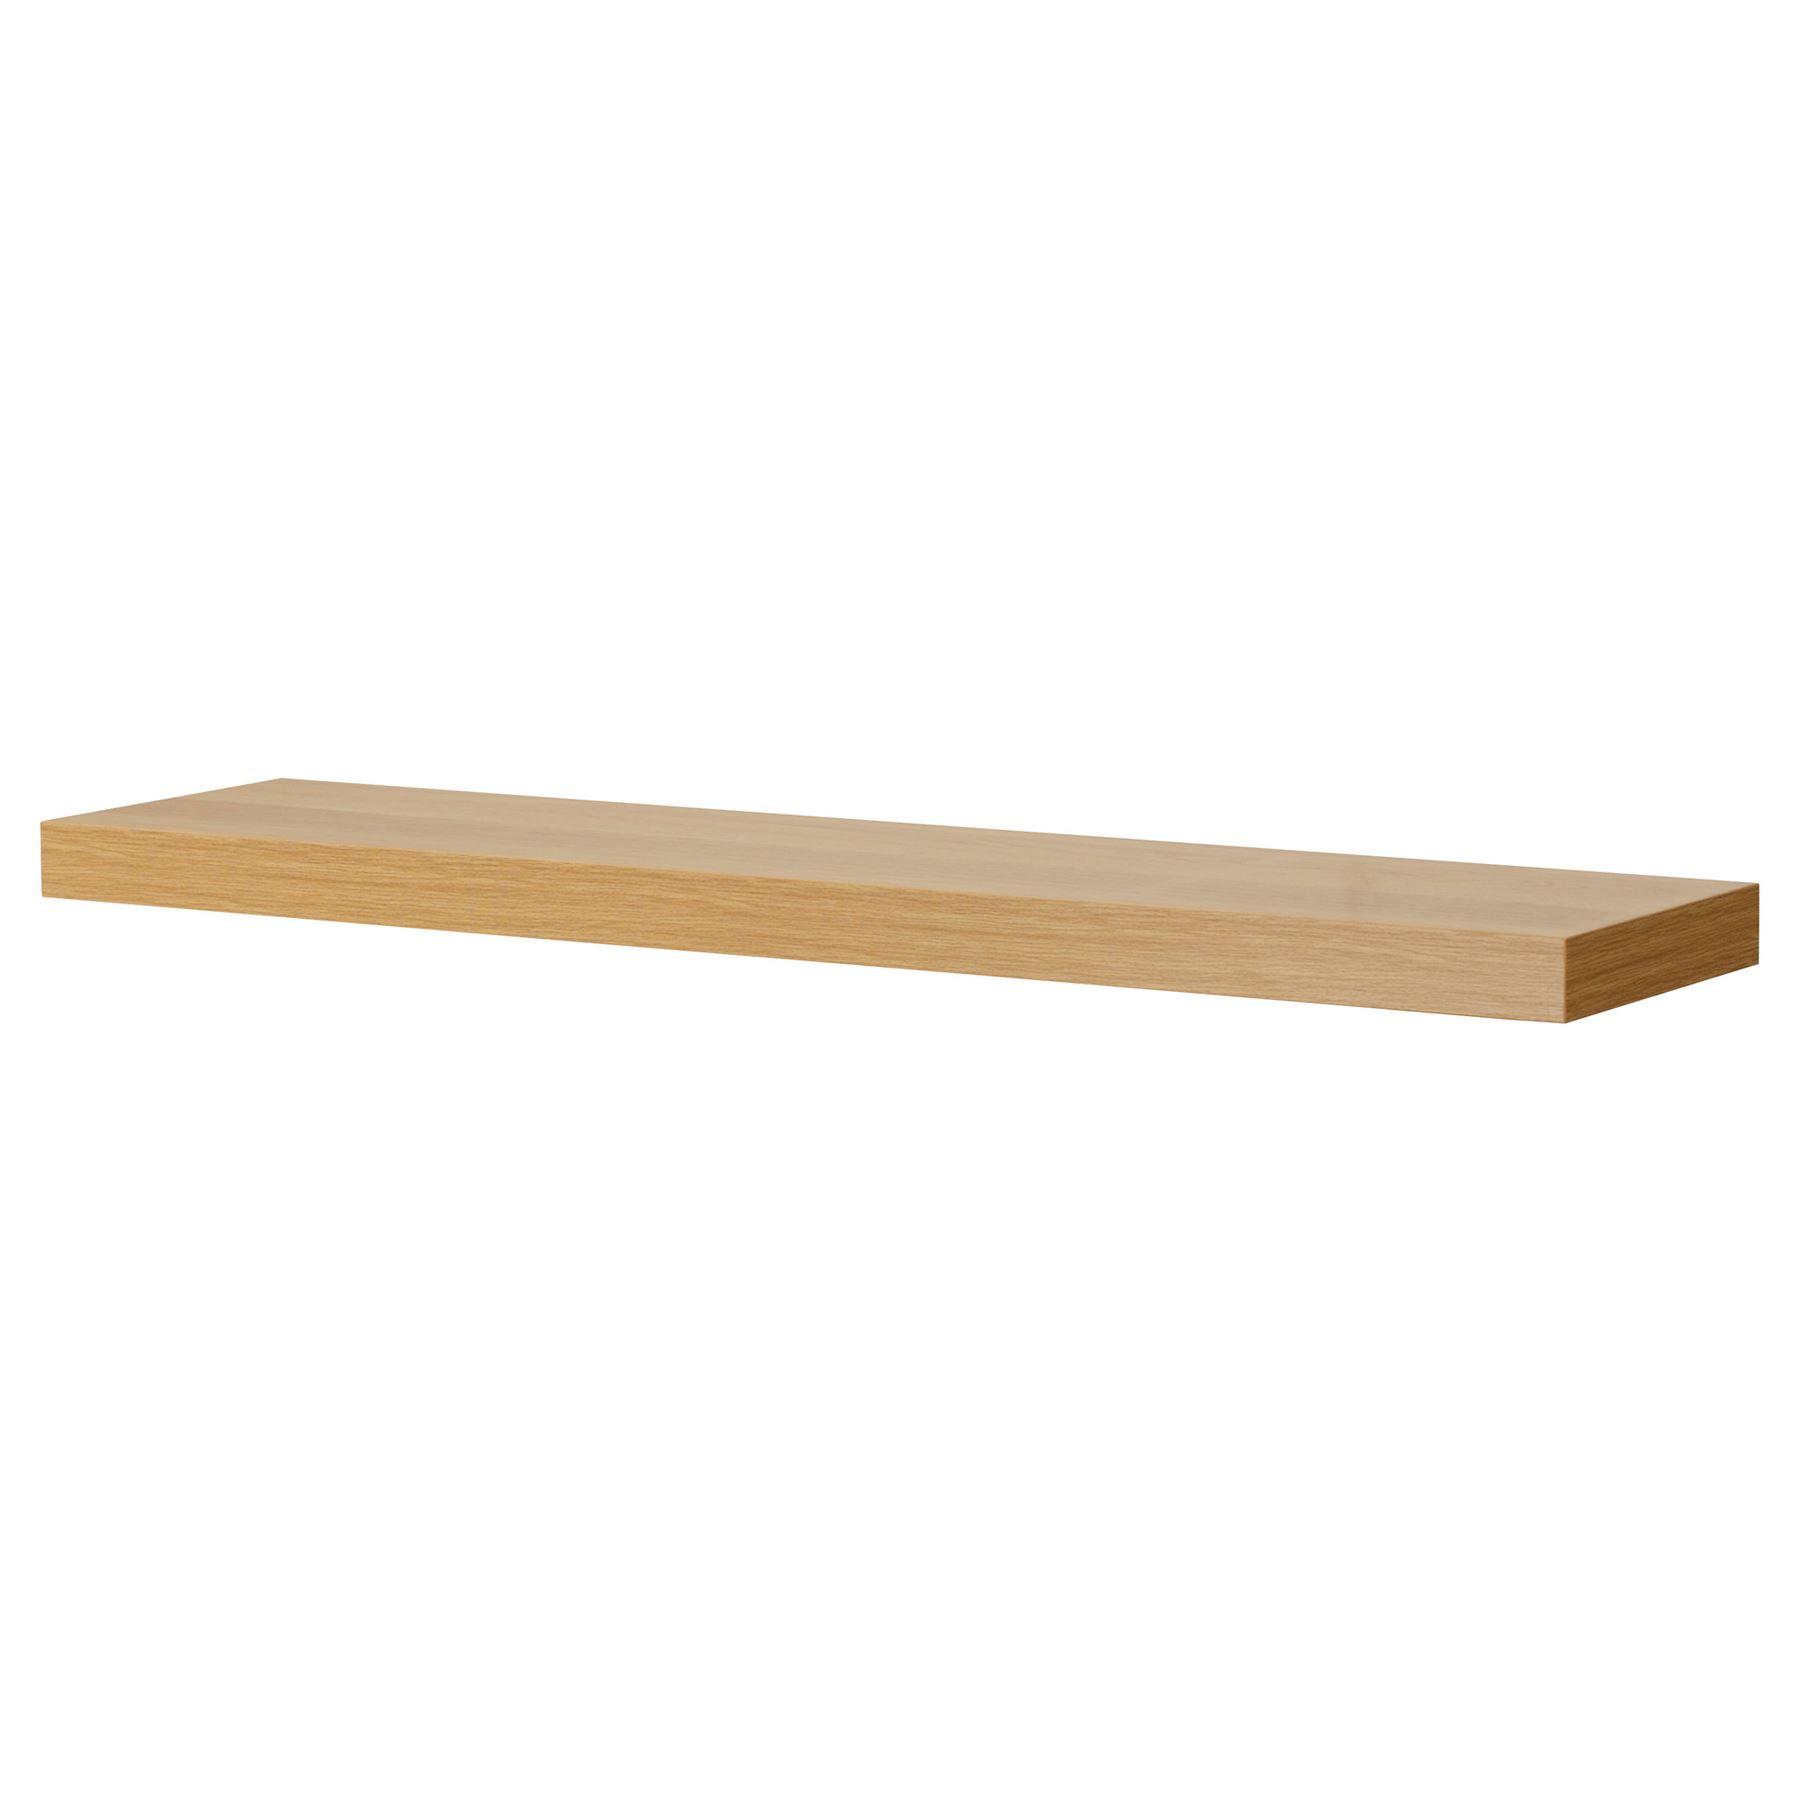 Ikea Lack Floating Wall Shelf Shelves Display 110x26 Cm